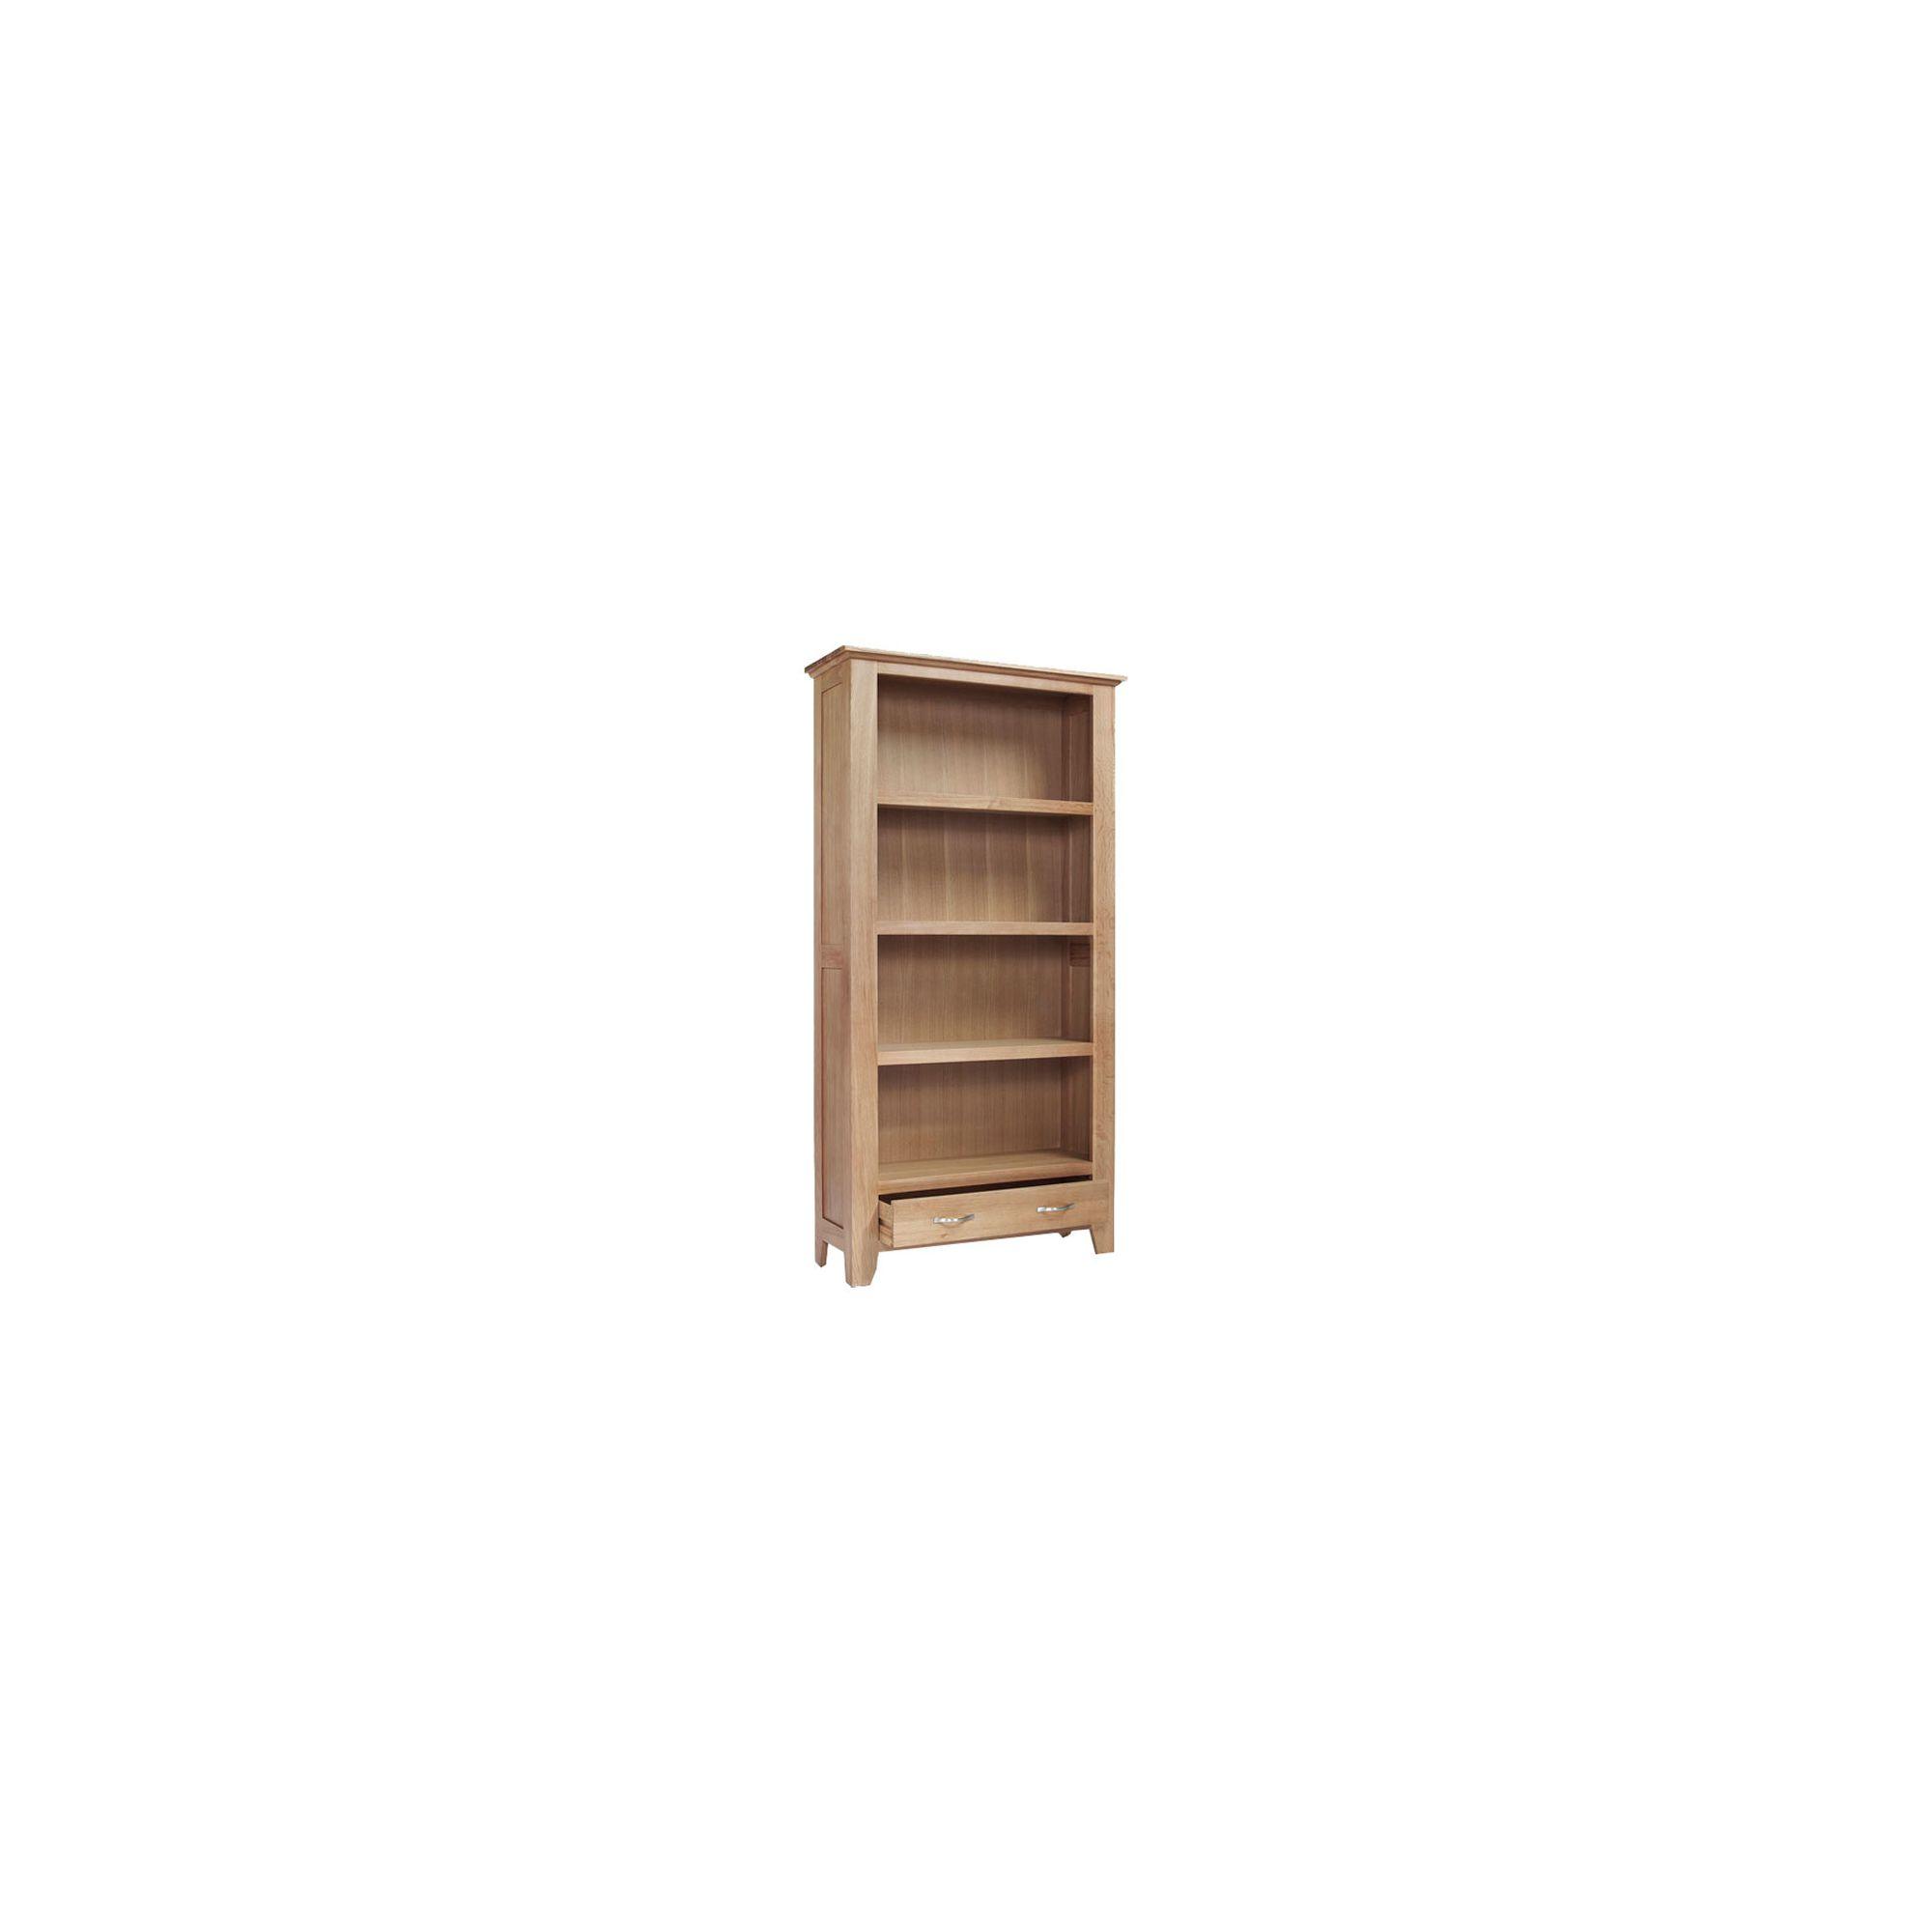 Ametis Sherwood Oak Bookcase - 98cm at Tesco Direct